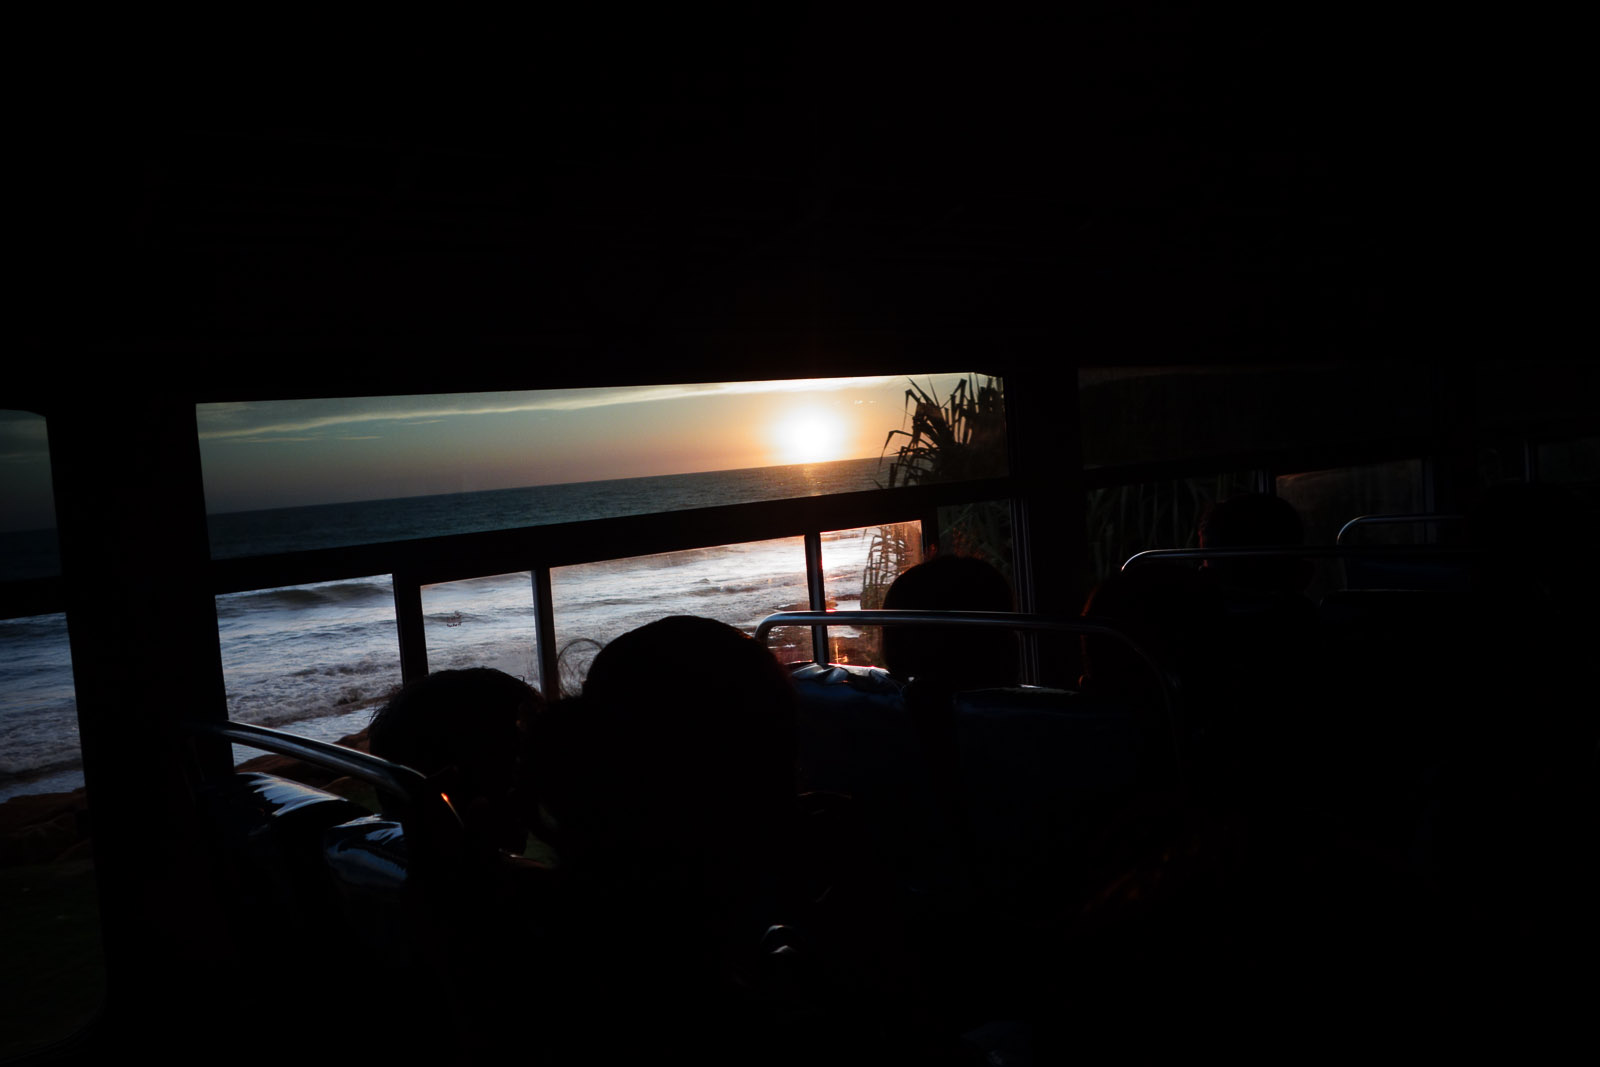 Sunshinestories-surf-travel-blog-DSC03548